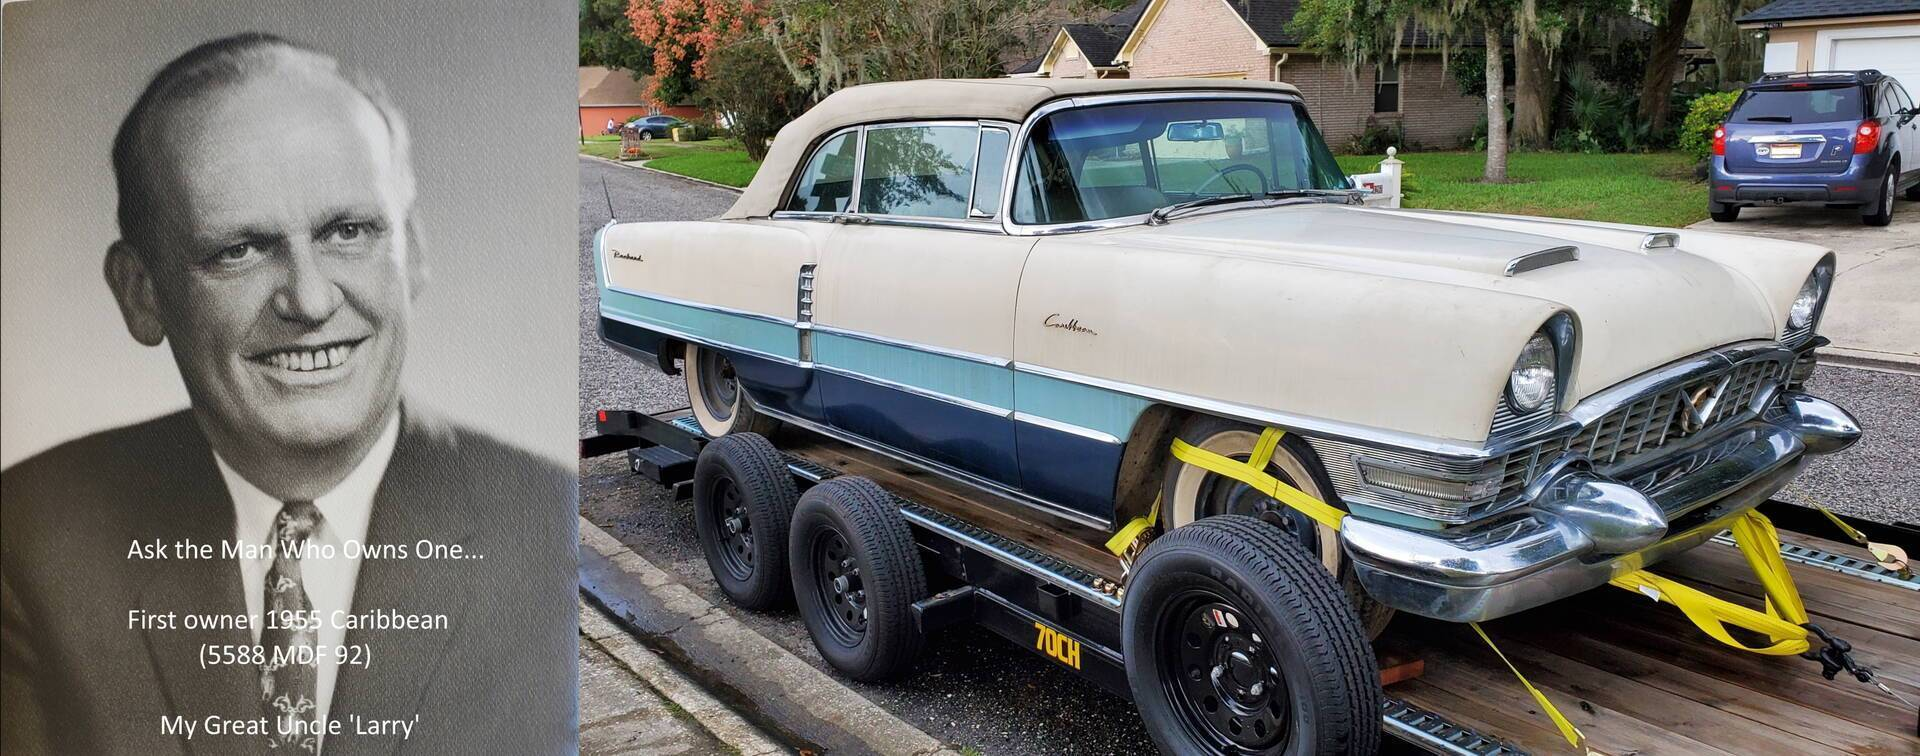 1955 Caribbean - 5588 MDF 92